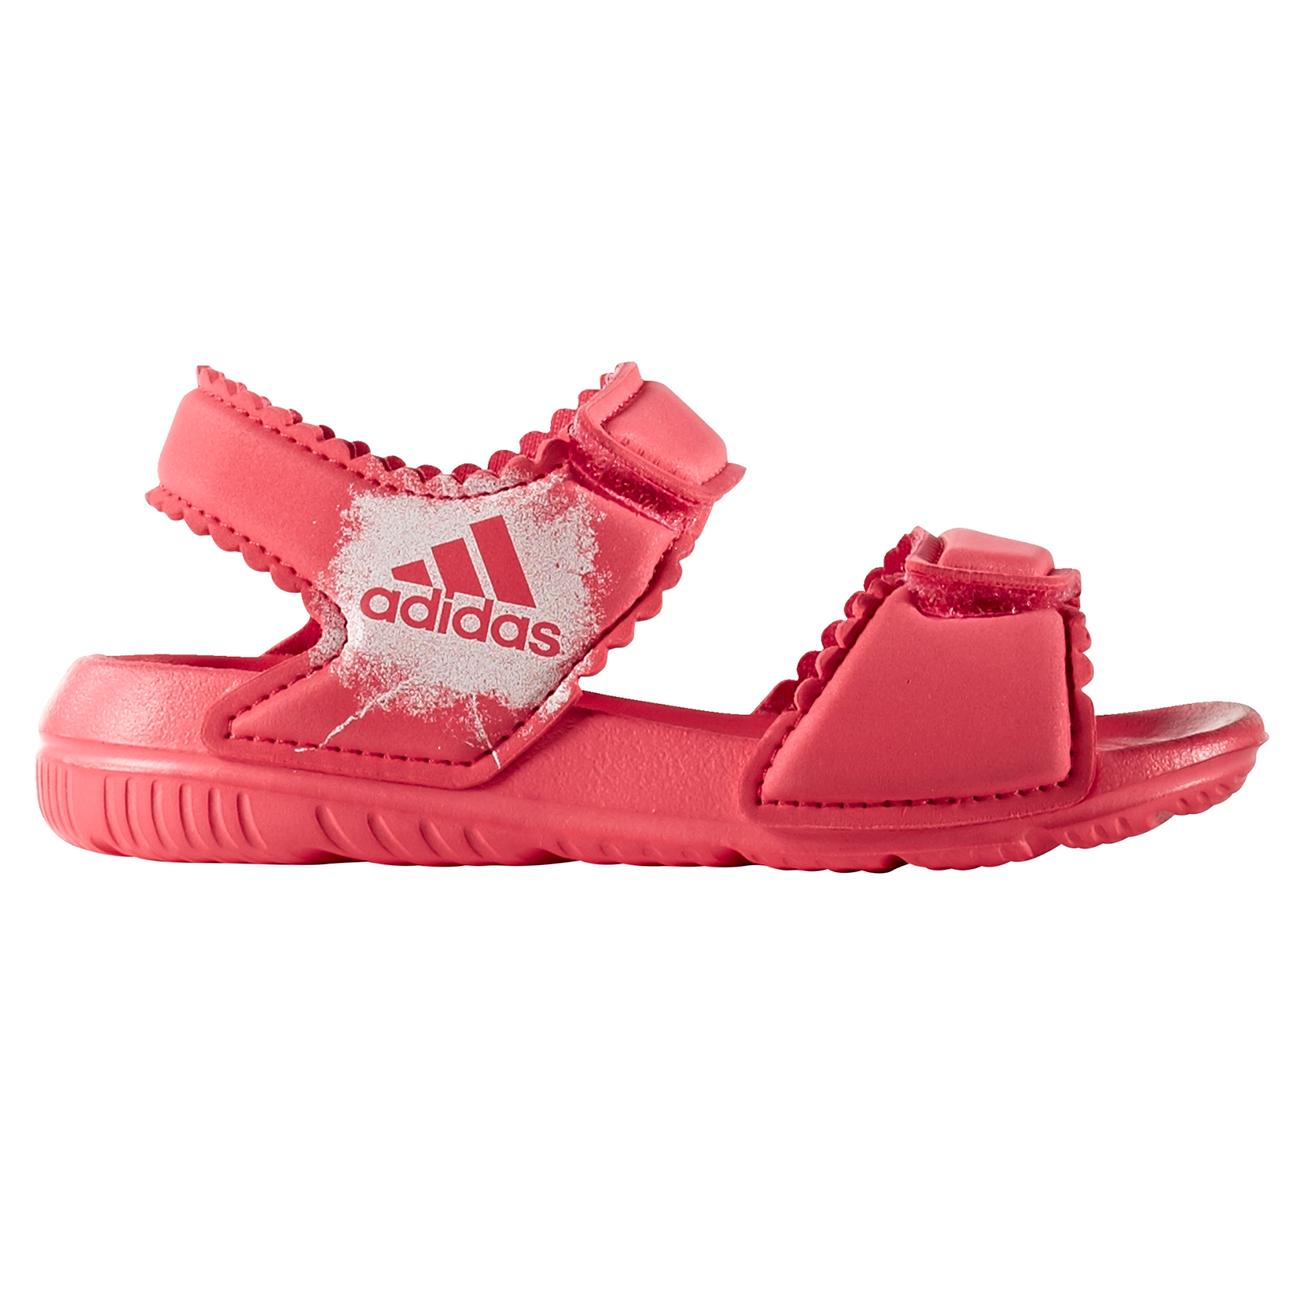 köp bra ankommer bra ut x adidas Swim Sandal Pink BA7868